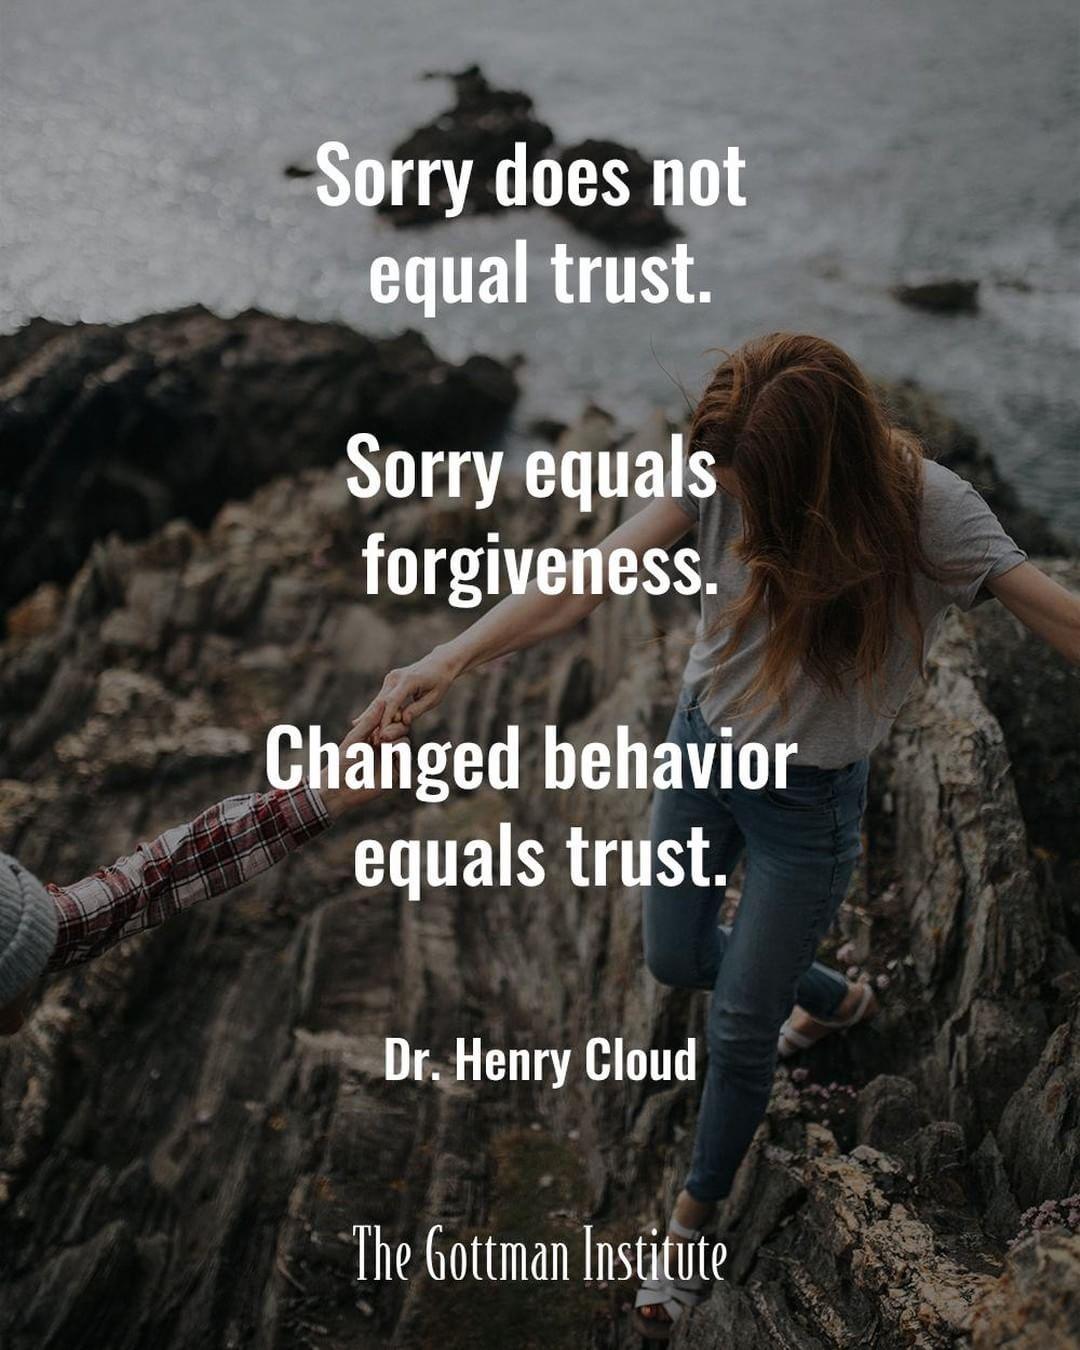 Changed behavior = trust  (via #TheGottmanInstitute